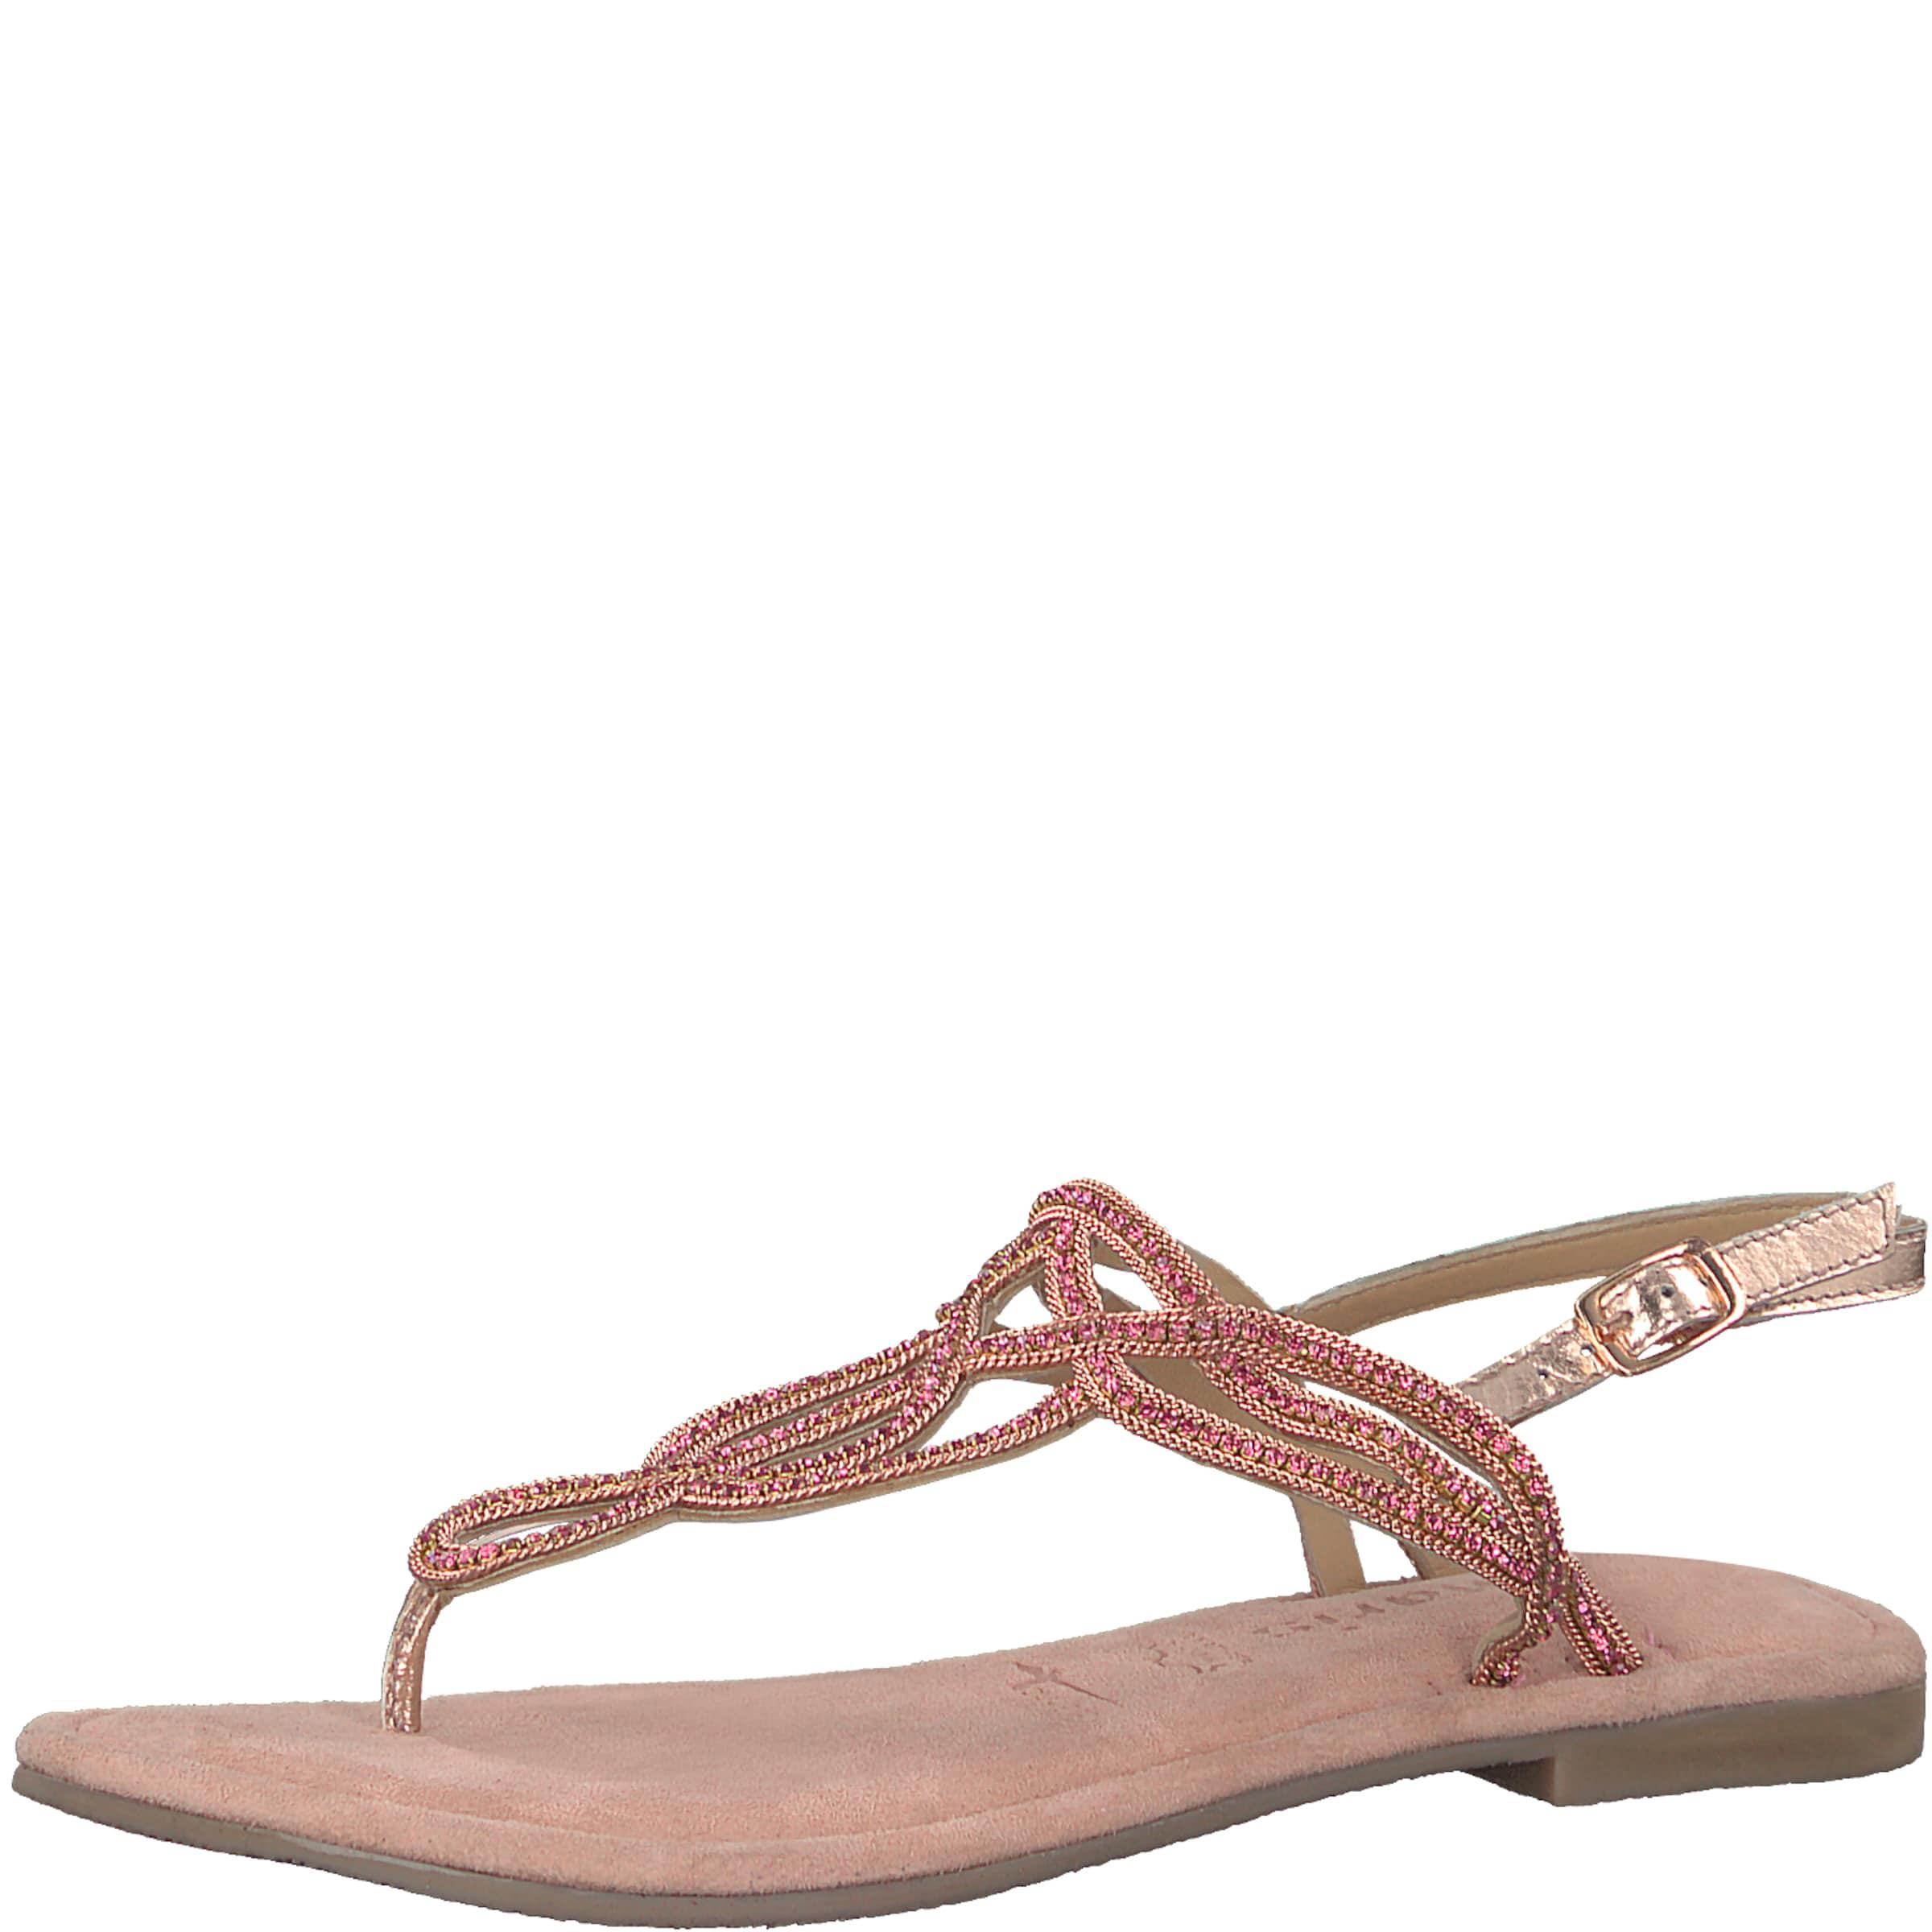 Haltbare Mode billige Schuhe TAMARIS | Sandale Schuhe Gut getragene Schuhe